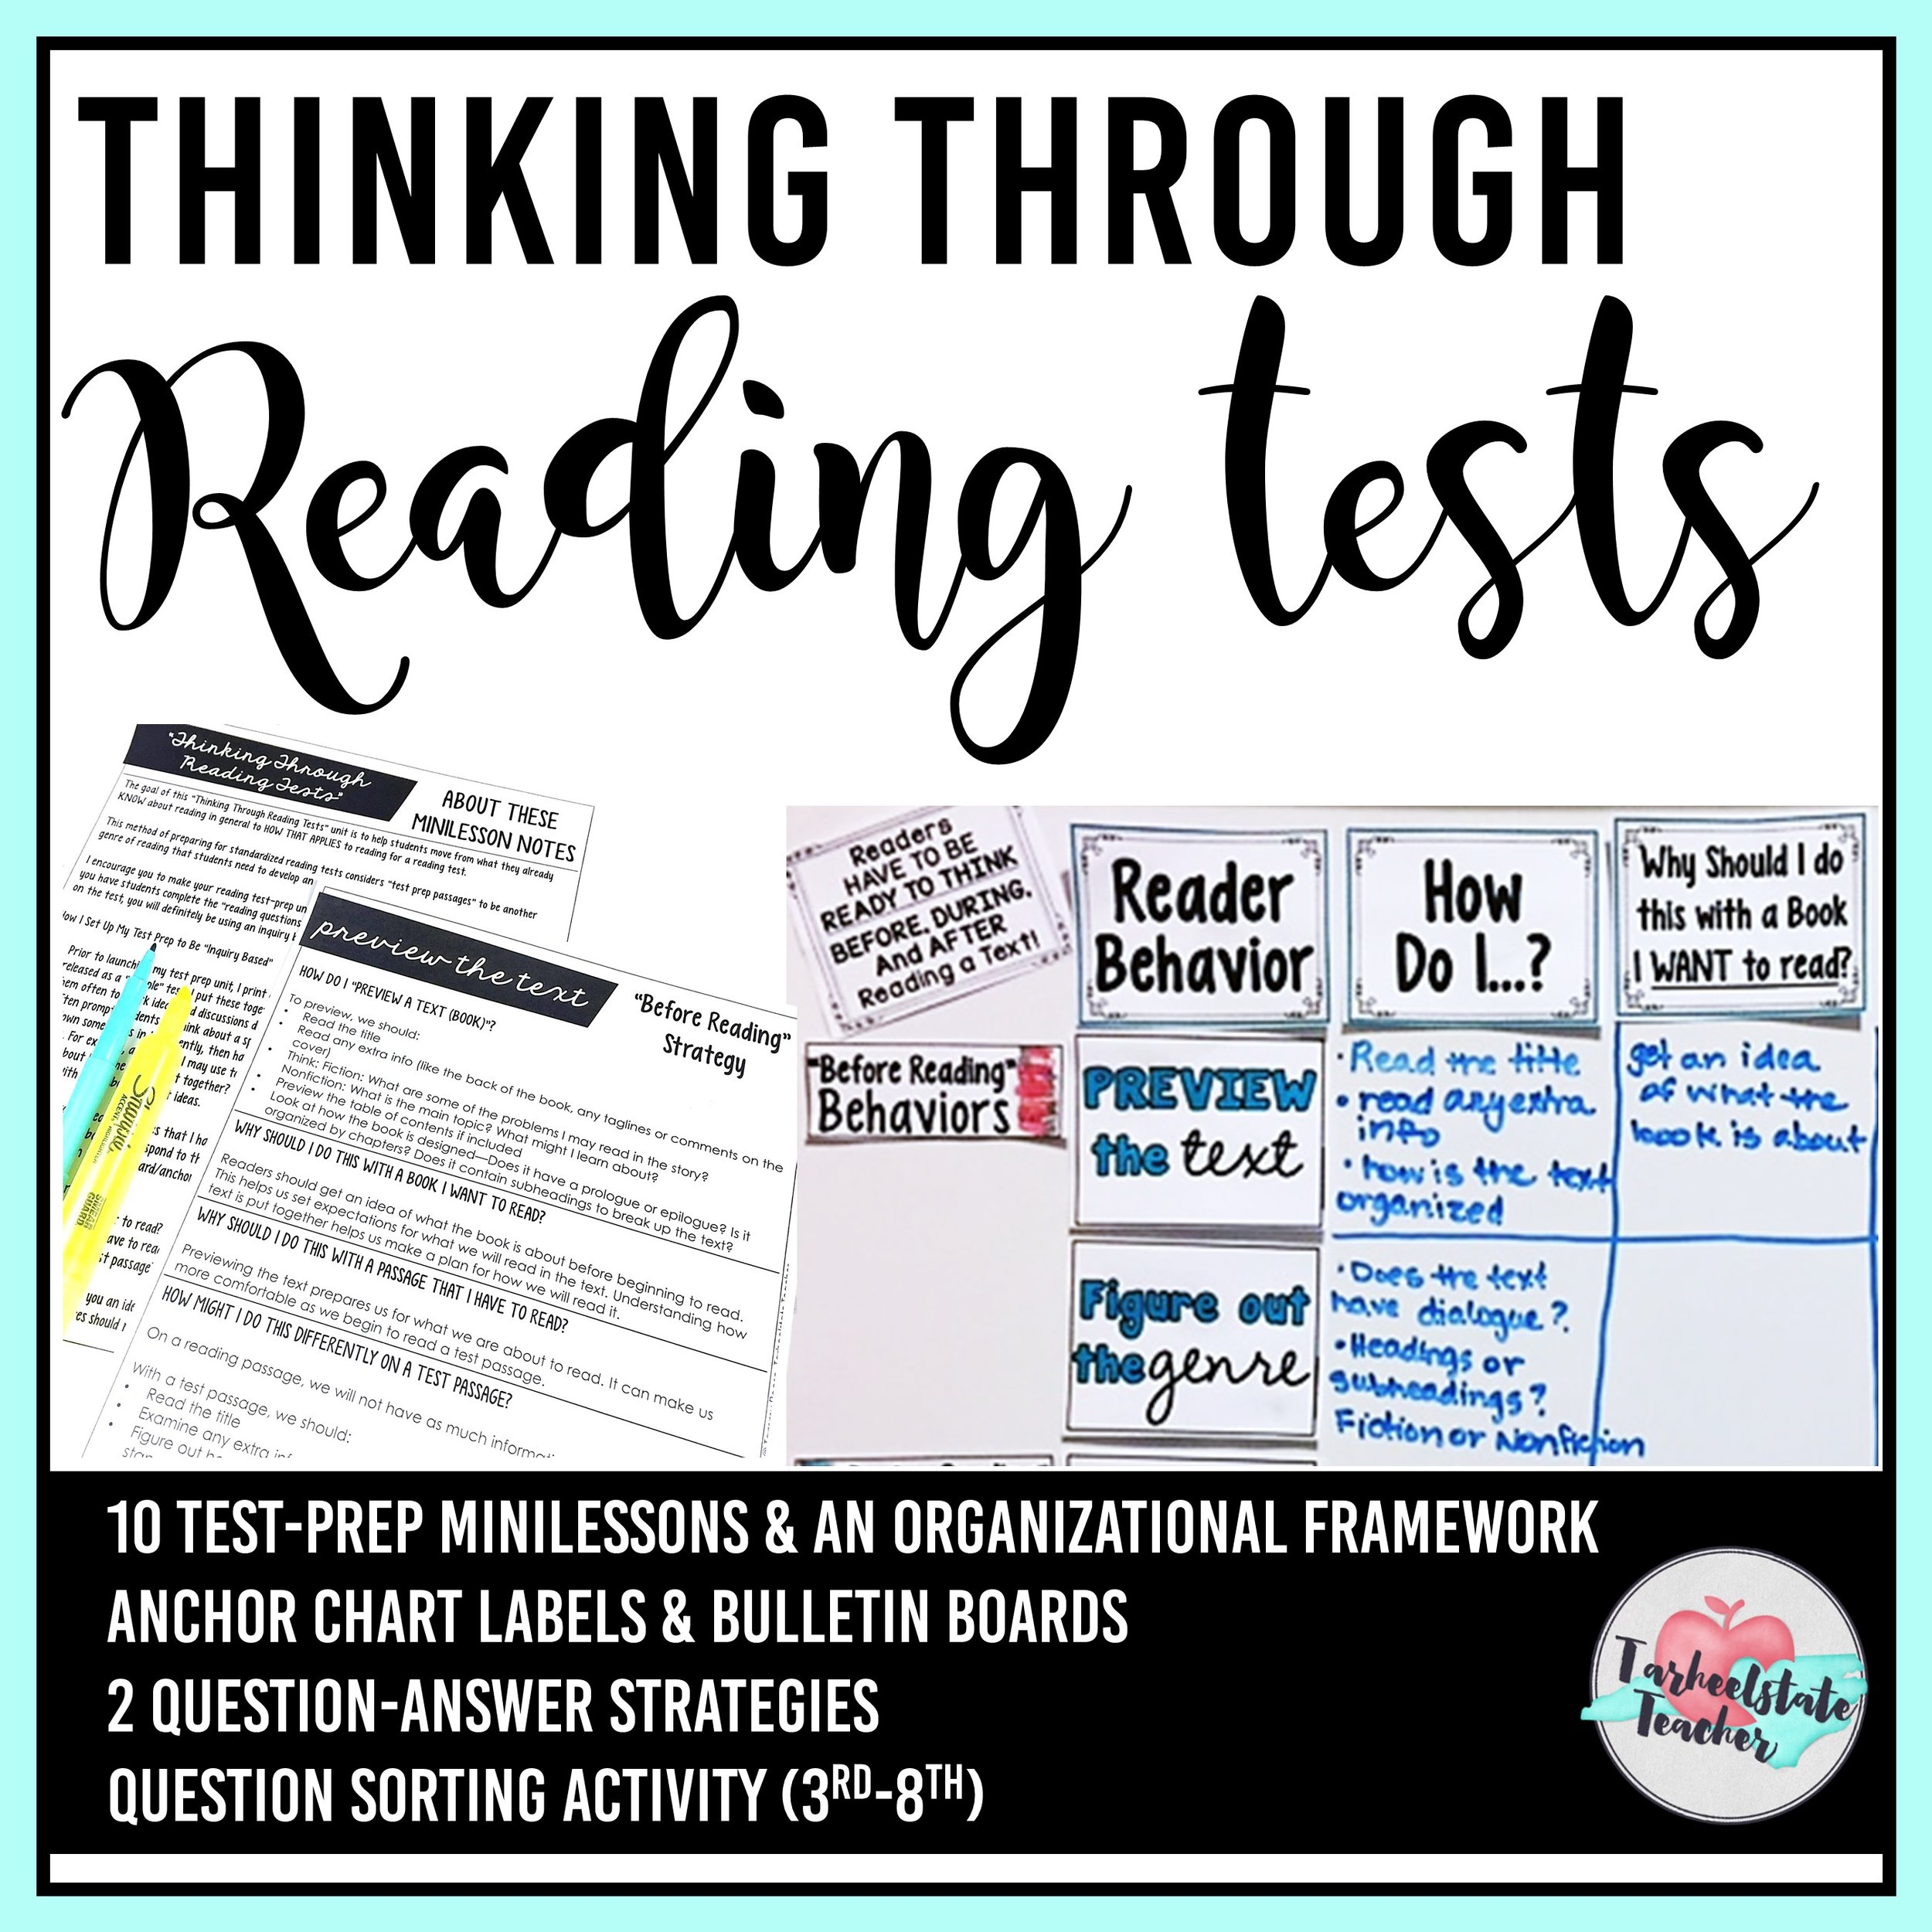 thinking through reading tests test prep unit.jpg